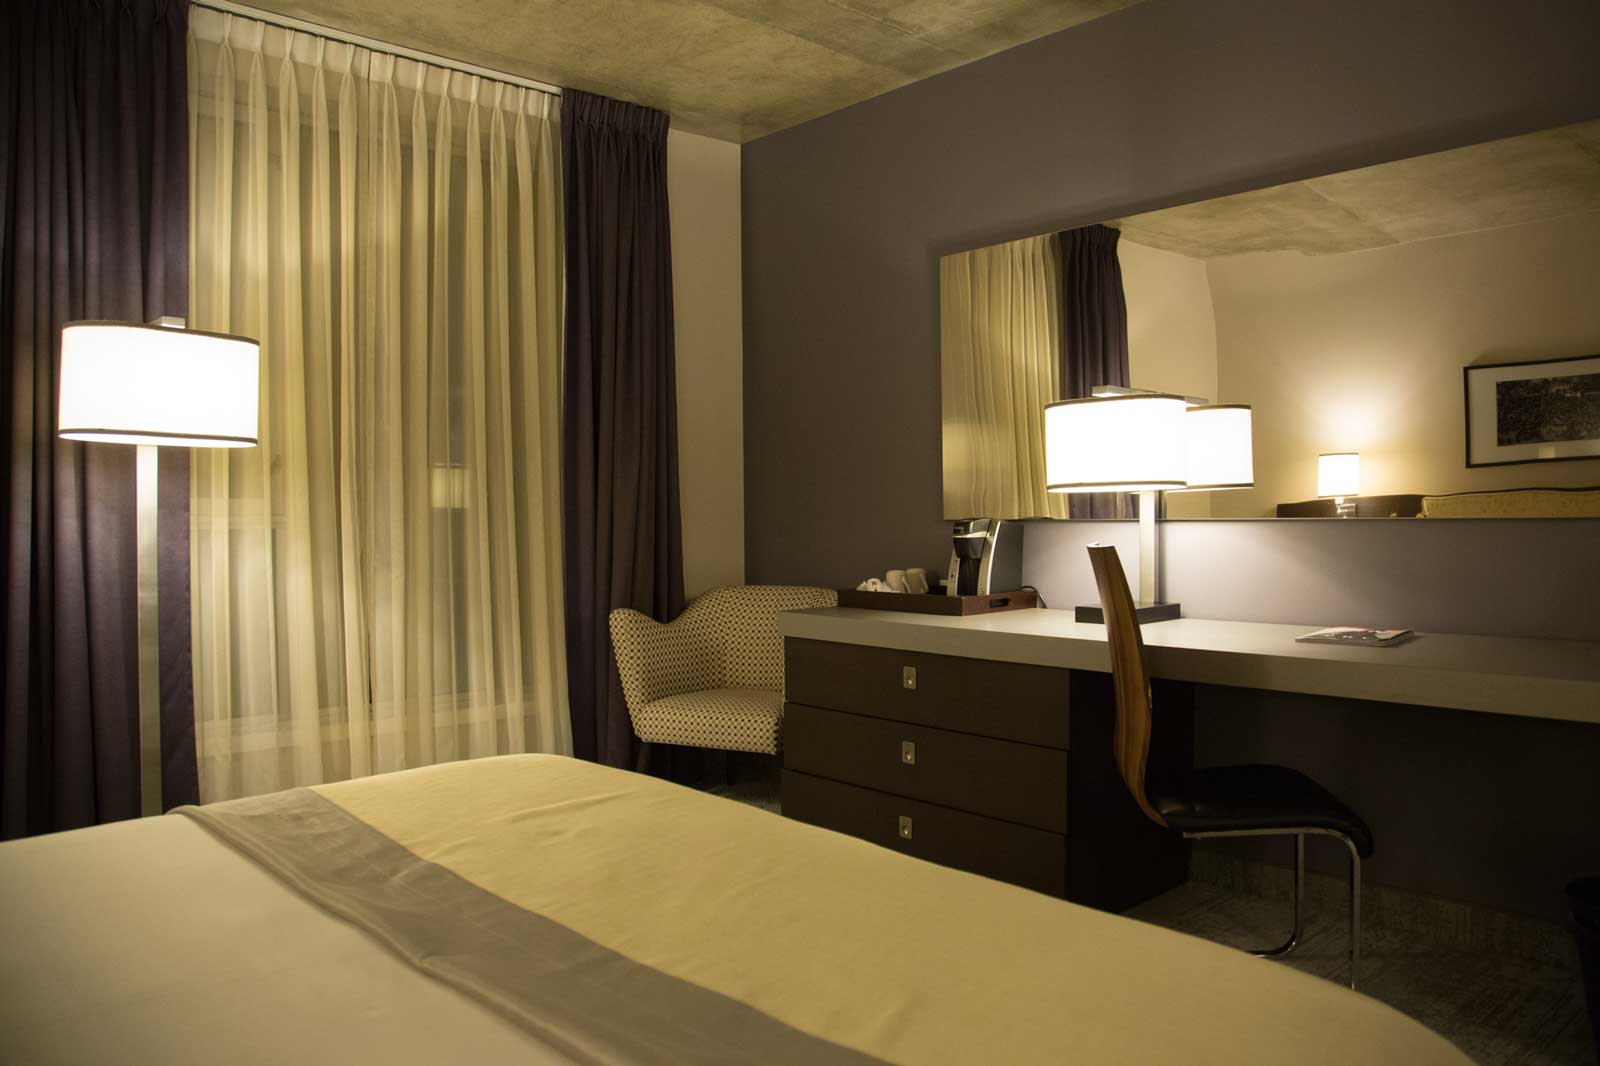 Hotel-10-Montreal-1.jpg